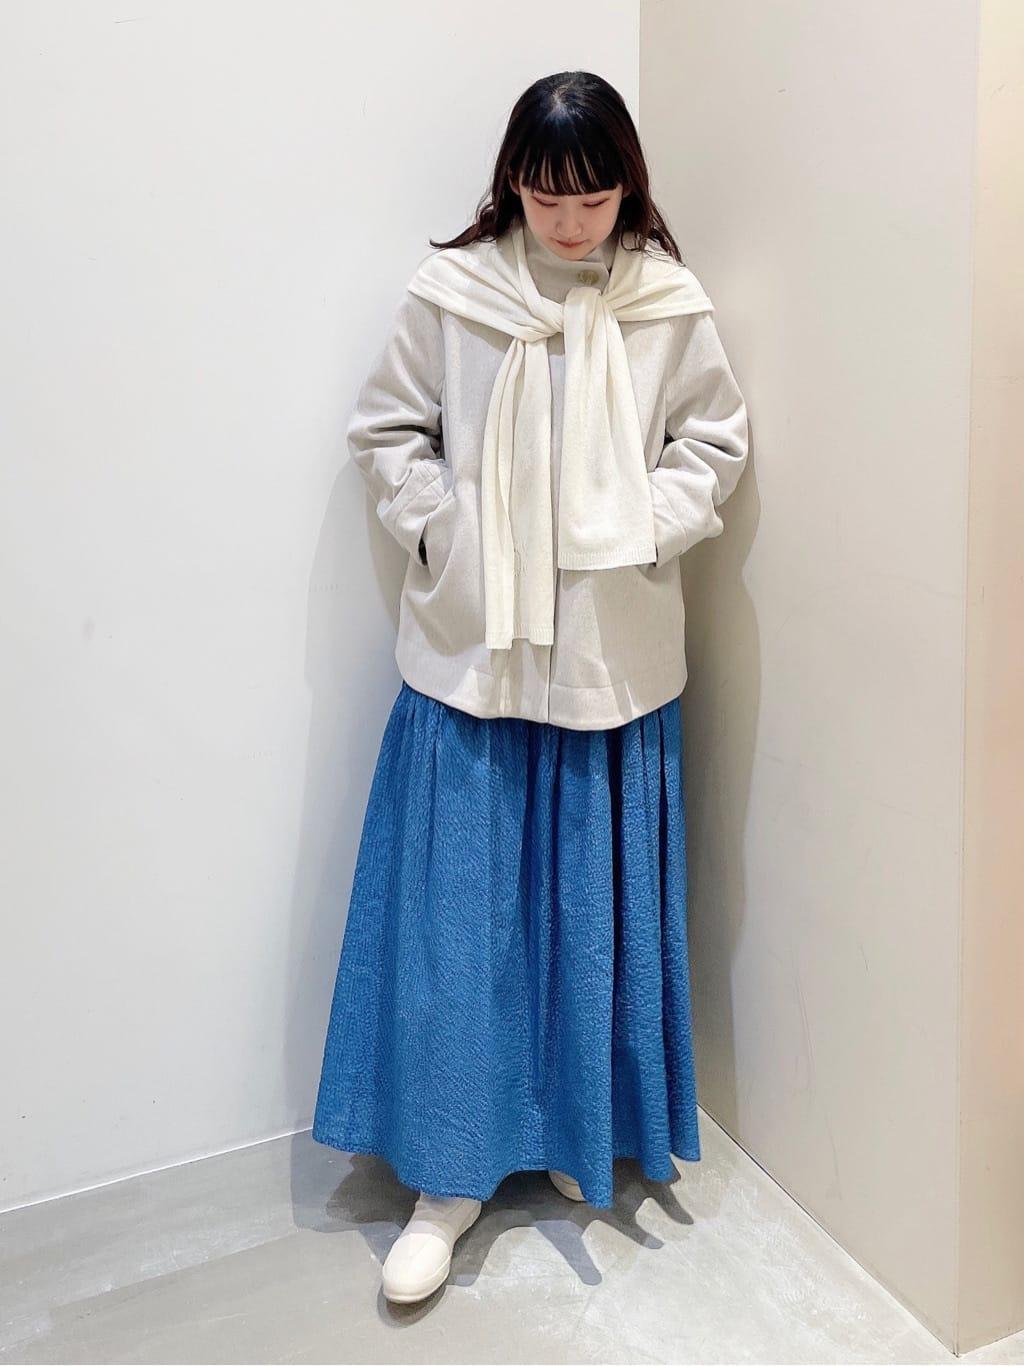 bulle de savon 阪急西宮ガーデンズ 身長:166cm 2021.09.22